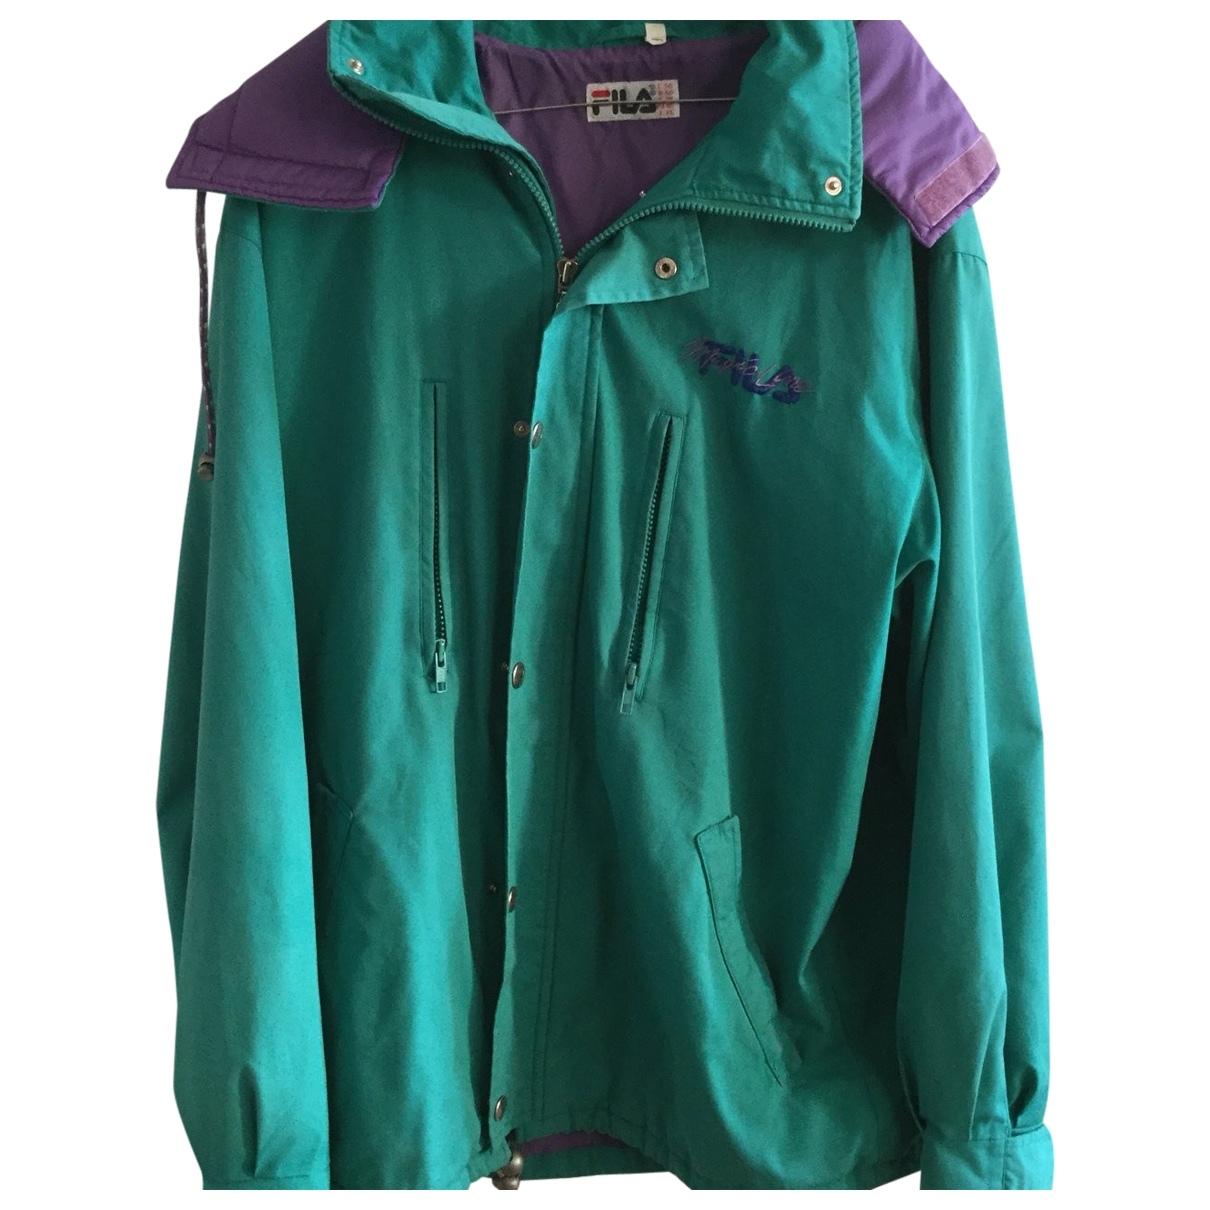 Fila \N Turquoise jacket  for Men 50 IT